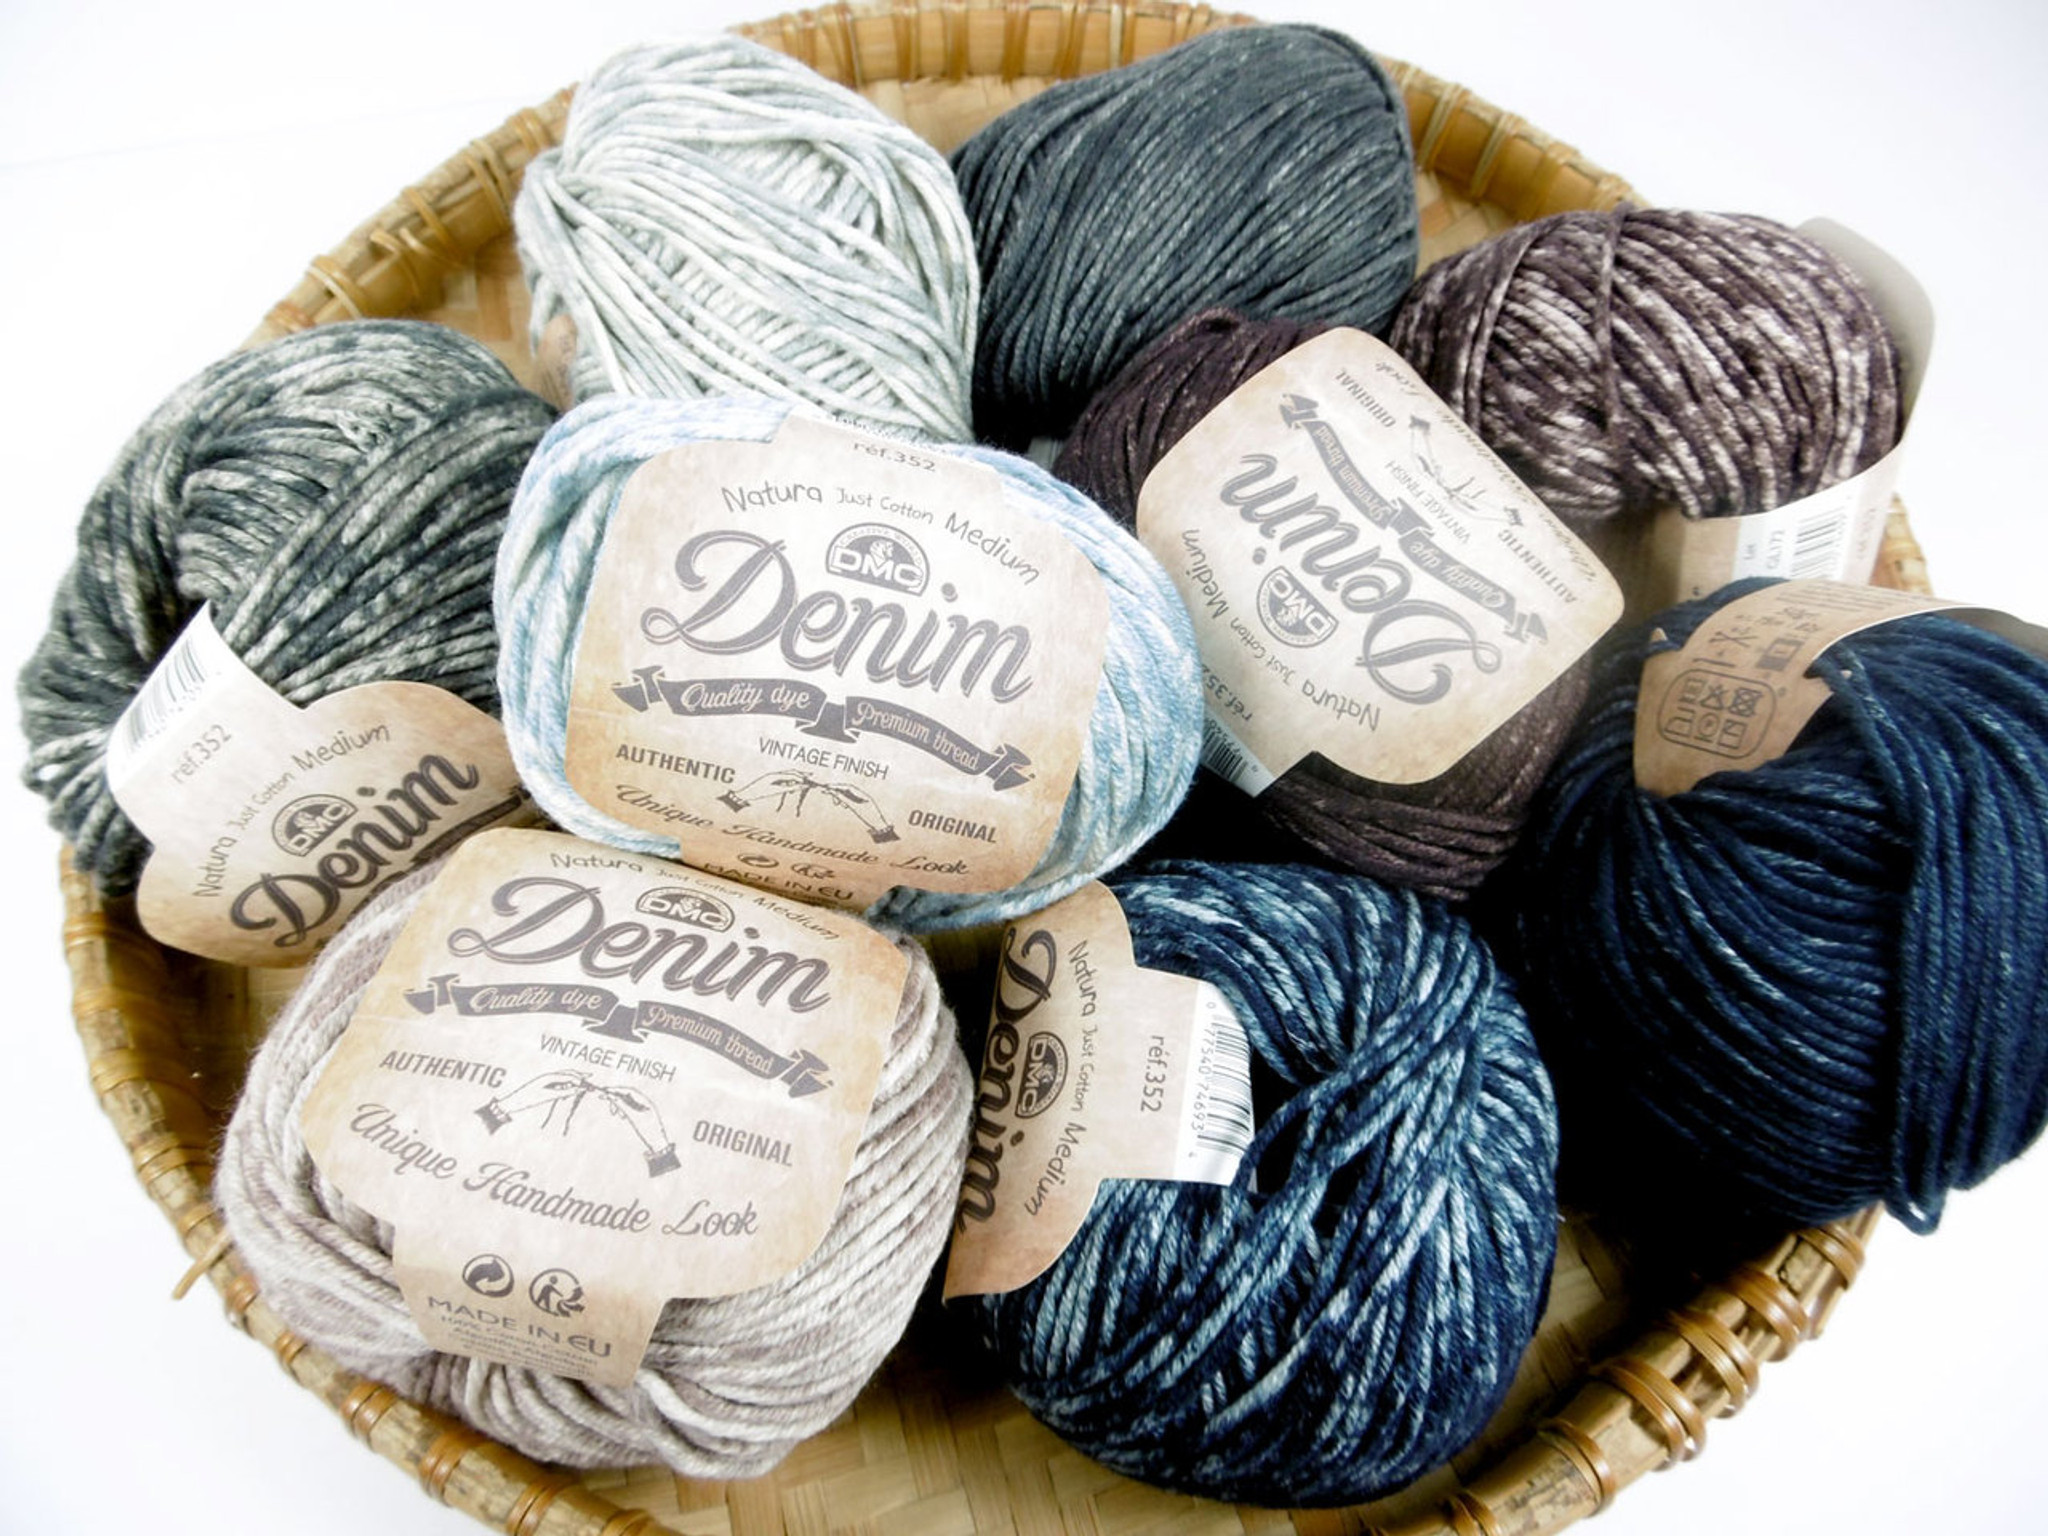 Colour 05 50g Ball DMC Natura 100/% Cotton 4 Ply Crochet /& Knitting Yarn Blue